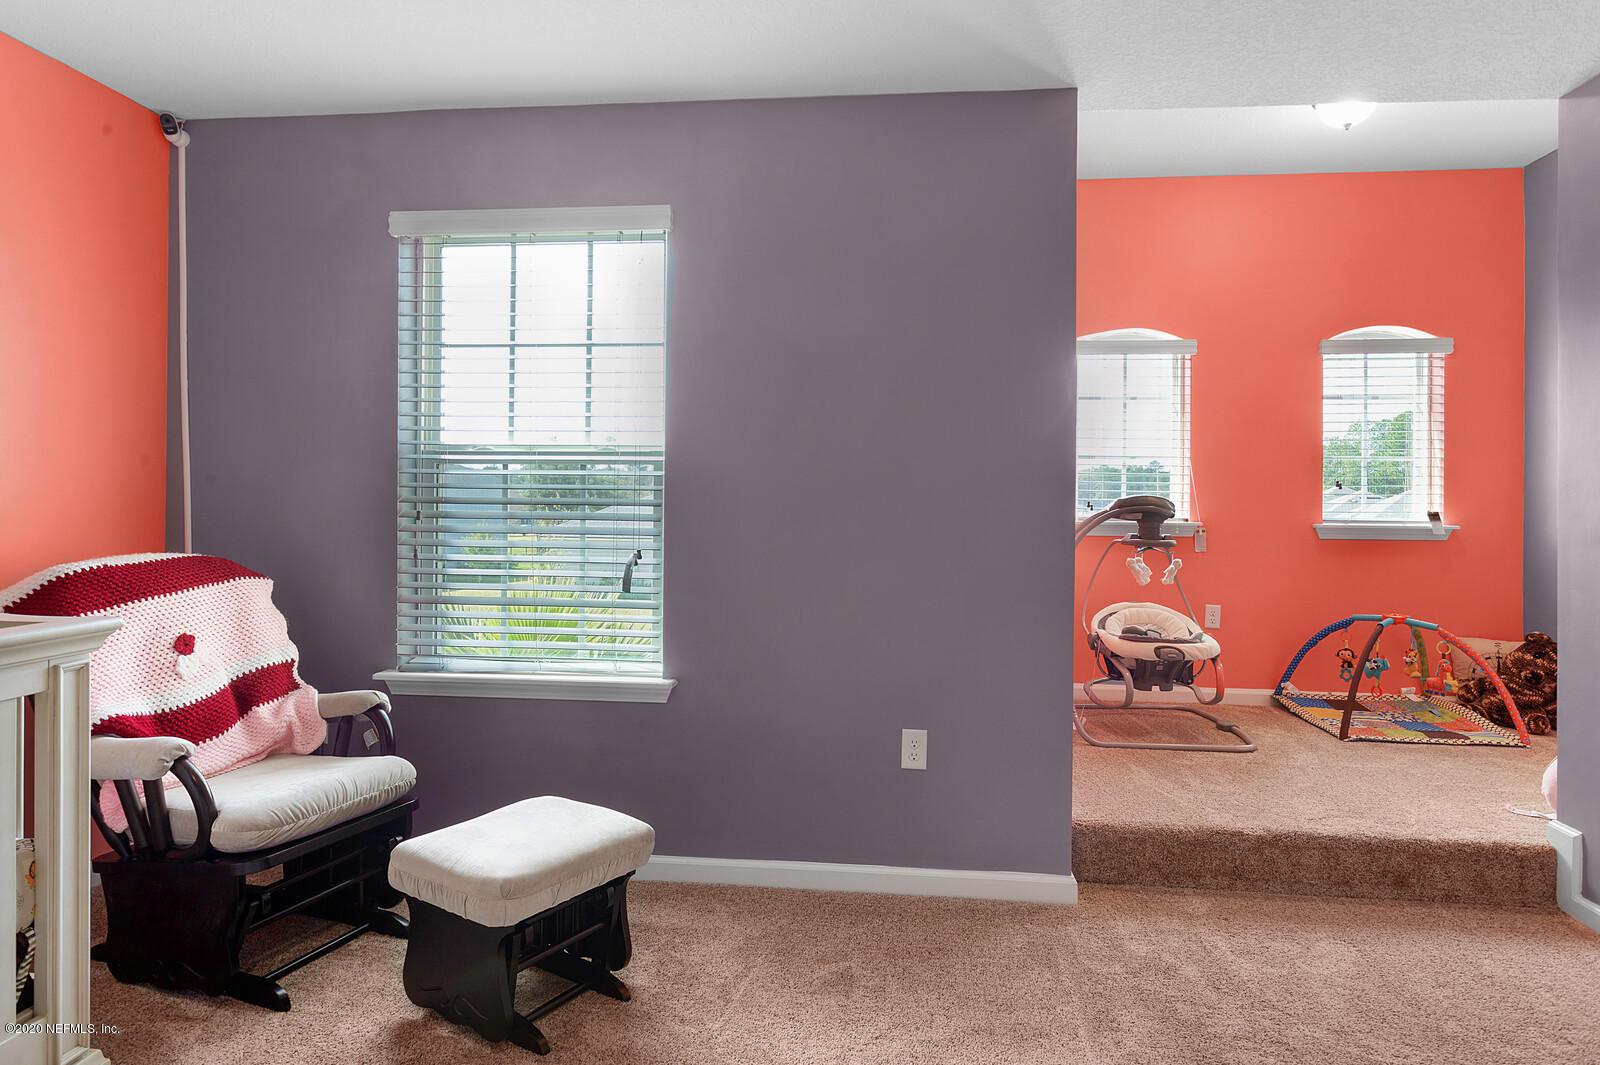 3985 HAMMOCK BLUFF, JACKSONVILLE, FLORIDA 32226, 6 Bedrooms Bedrooms, ,3 BathroomsBathrooms,Residential,For sale,HAMMOCK BLUFF,1080877